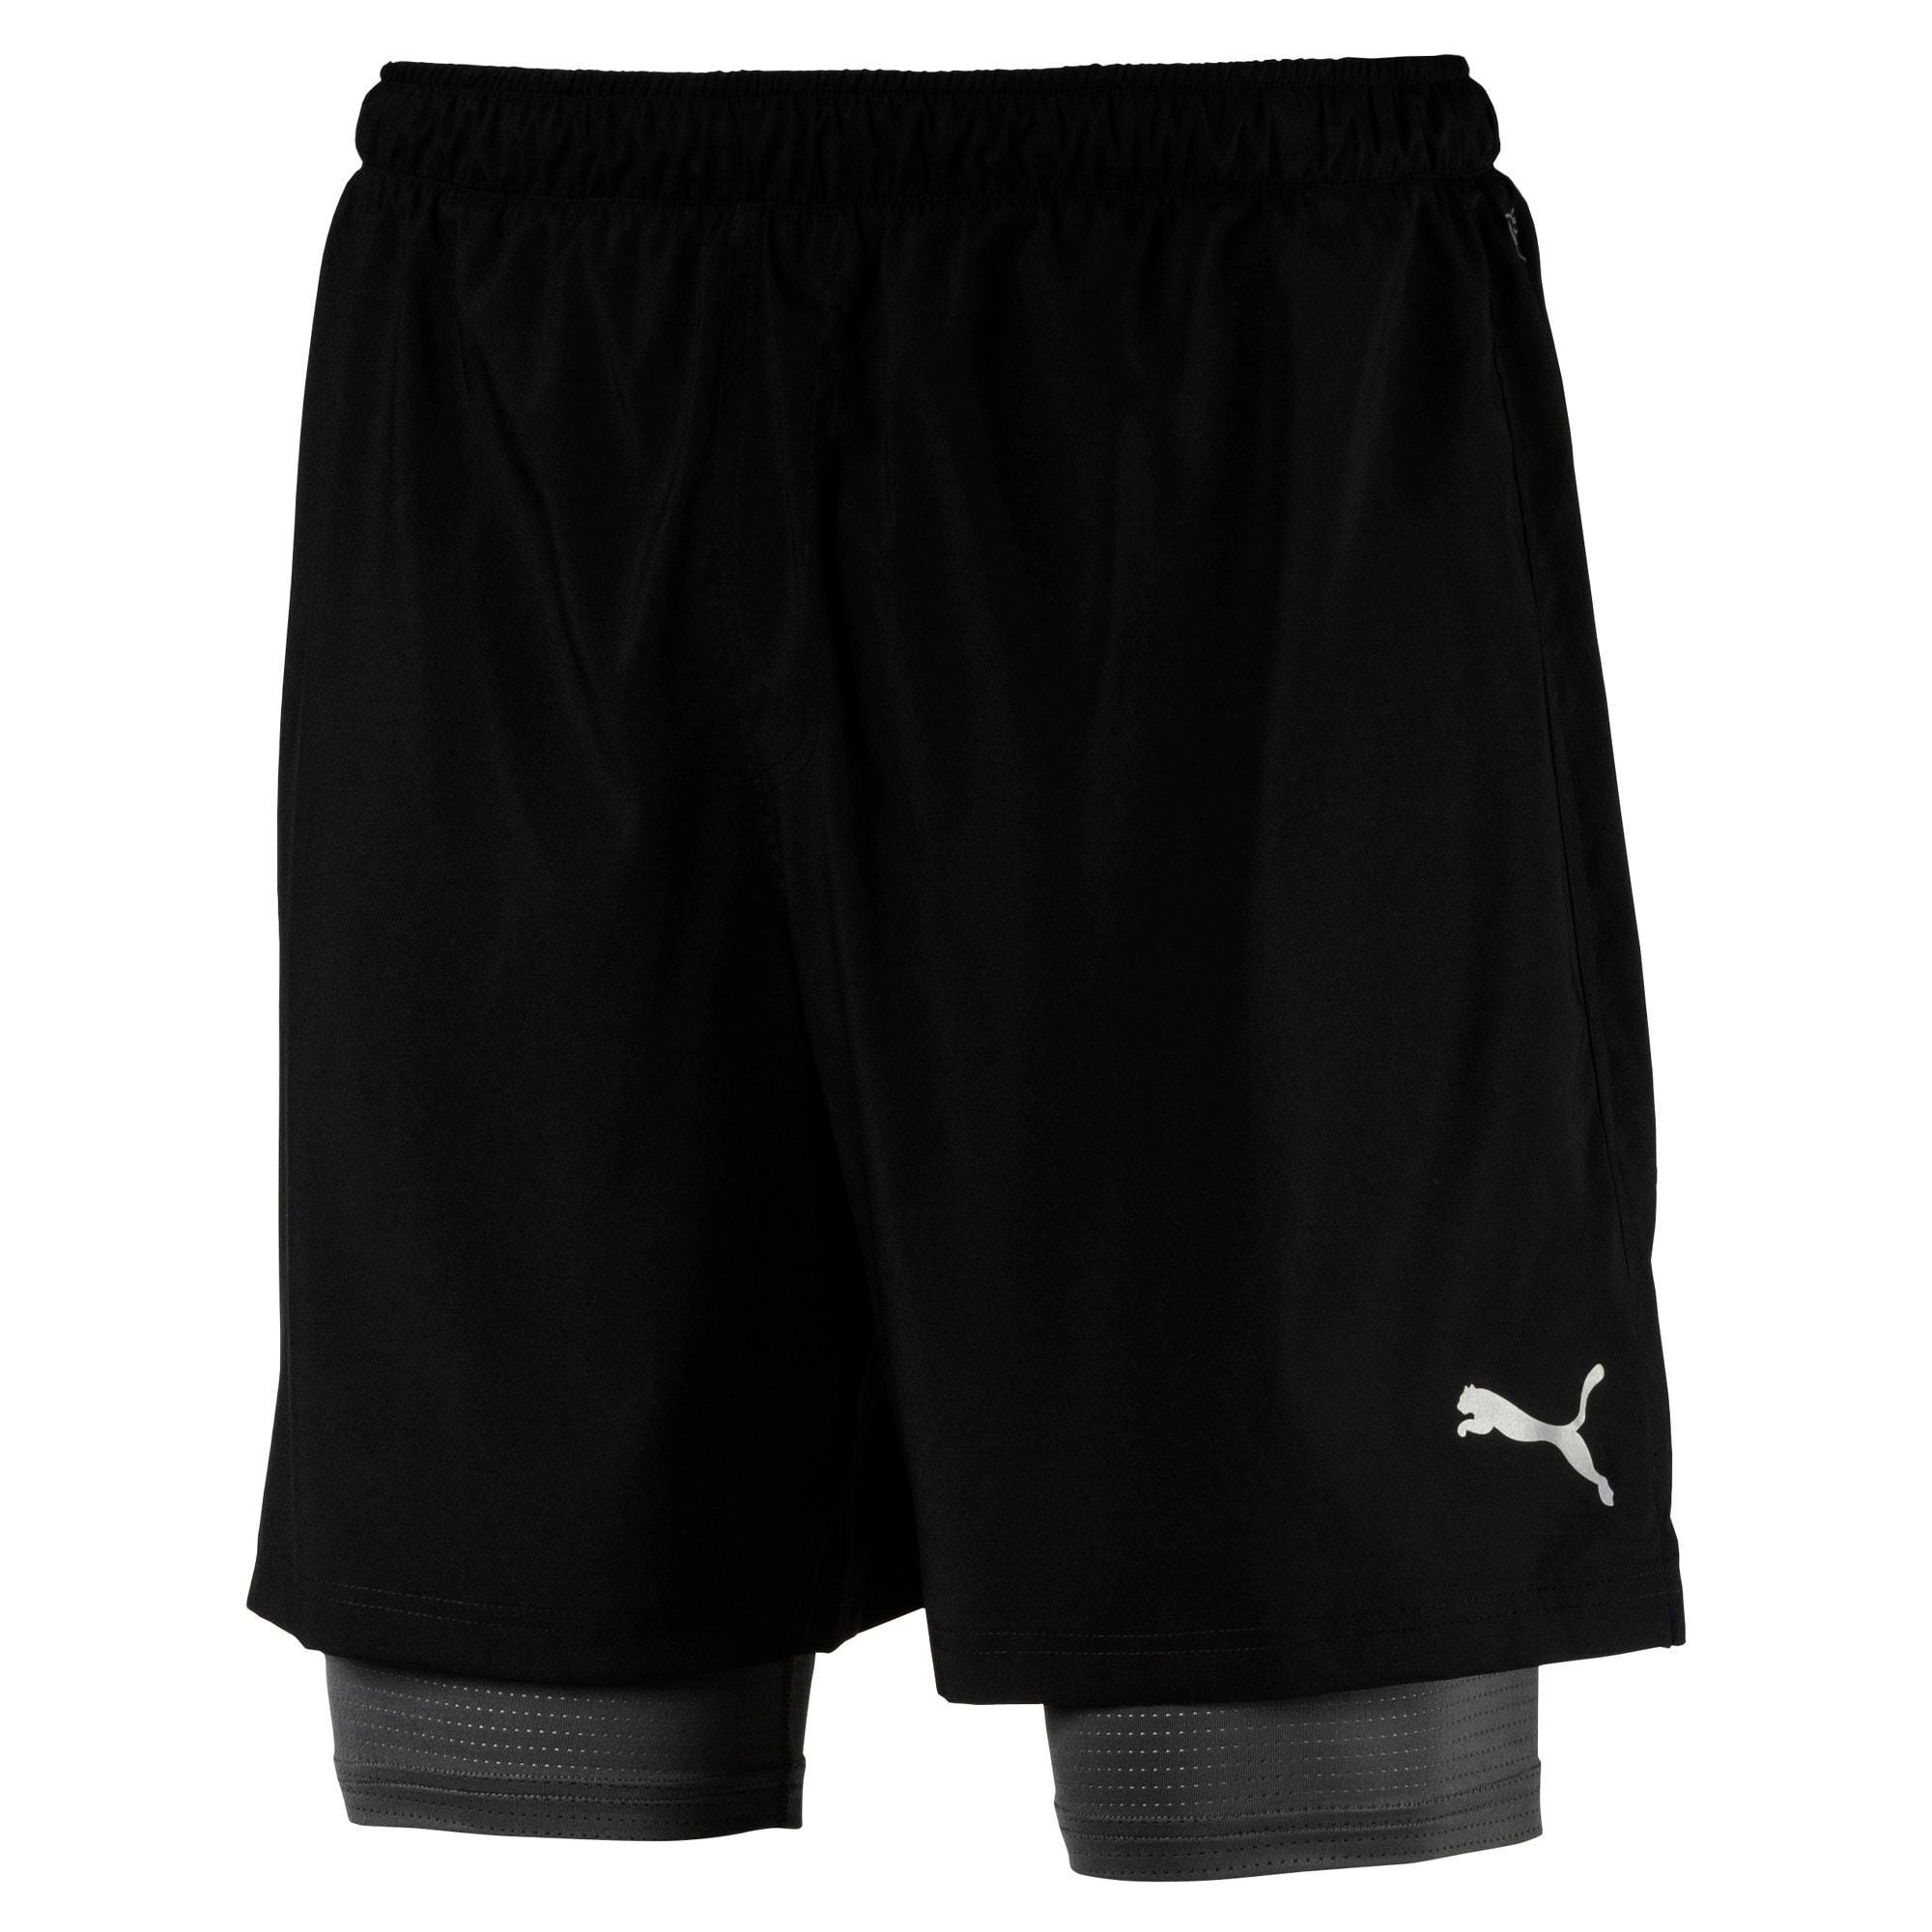 Thumbnail 4 of Running Men's IGNITE 2-in-1 Shorts, Puma Black, medium-IND